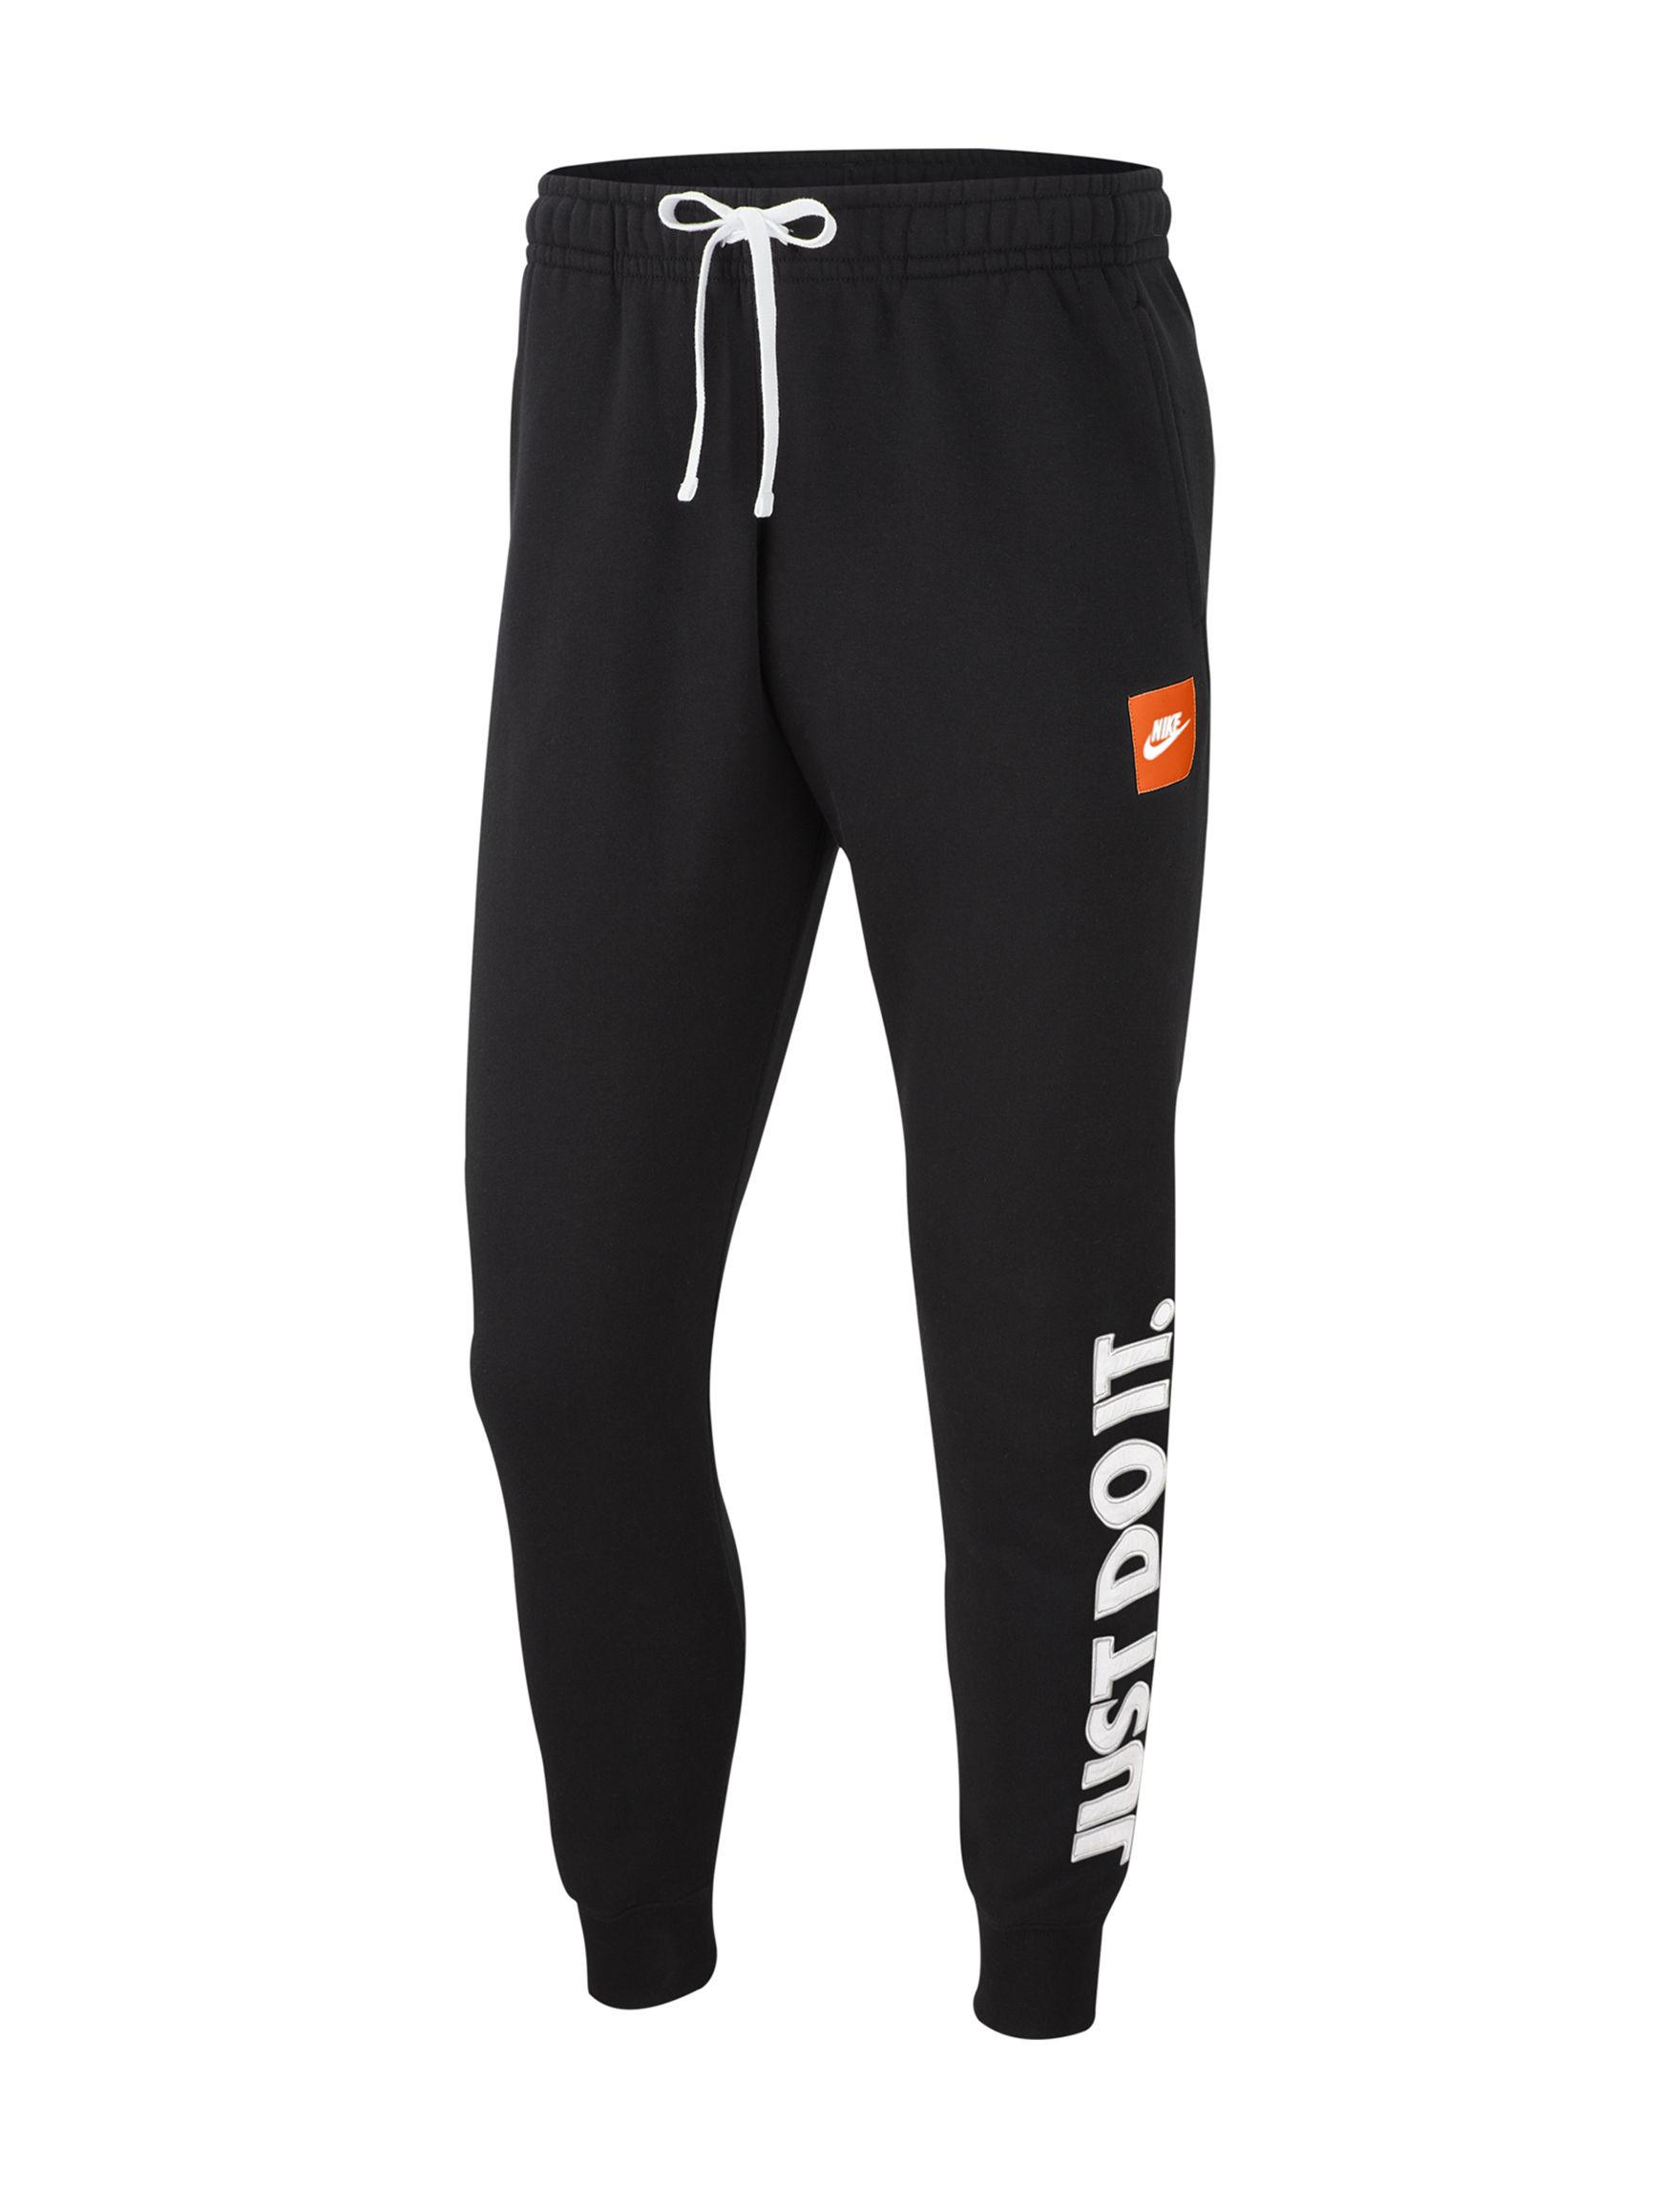 Nike Black / Multi